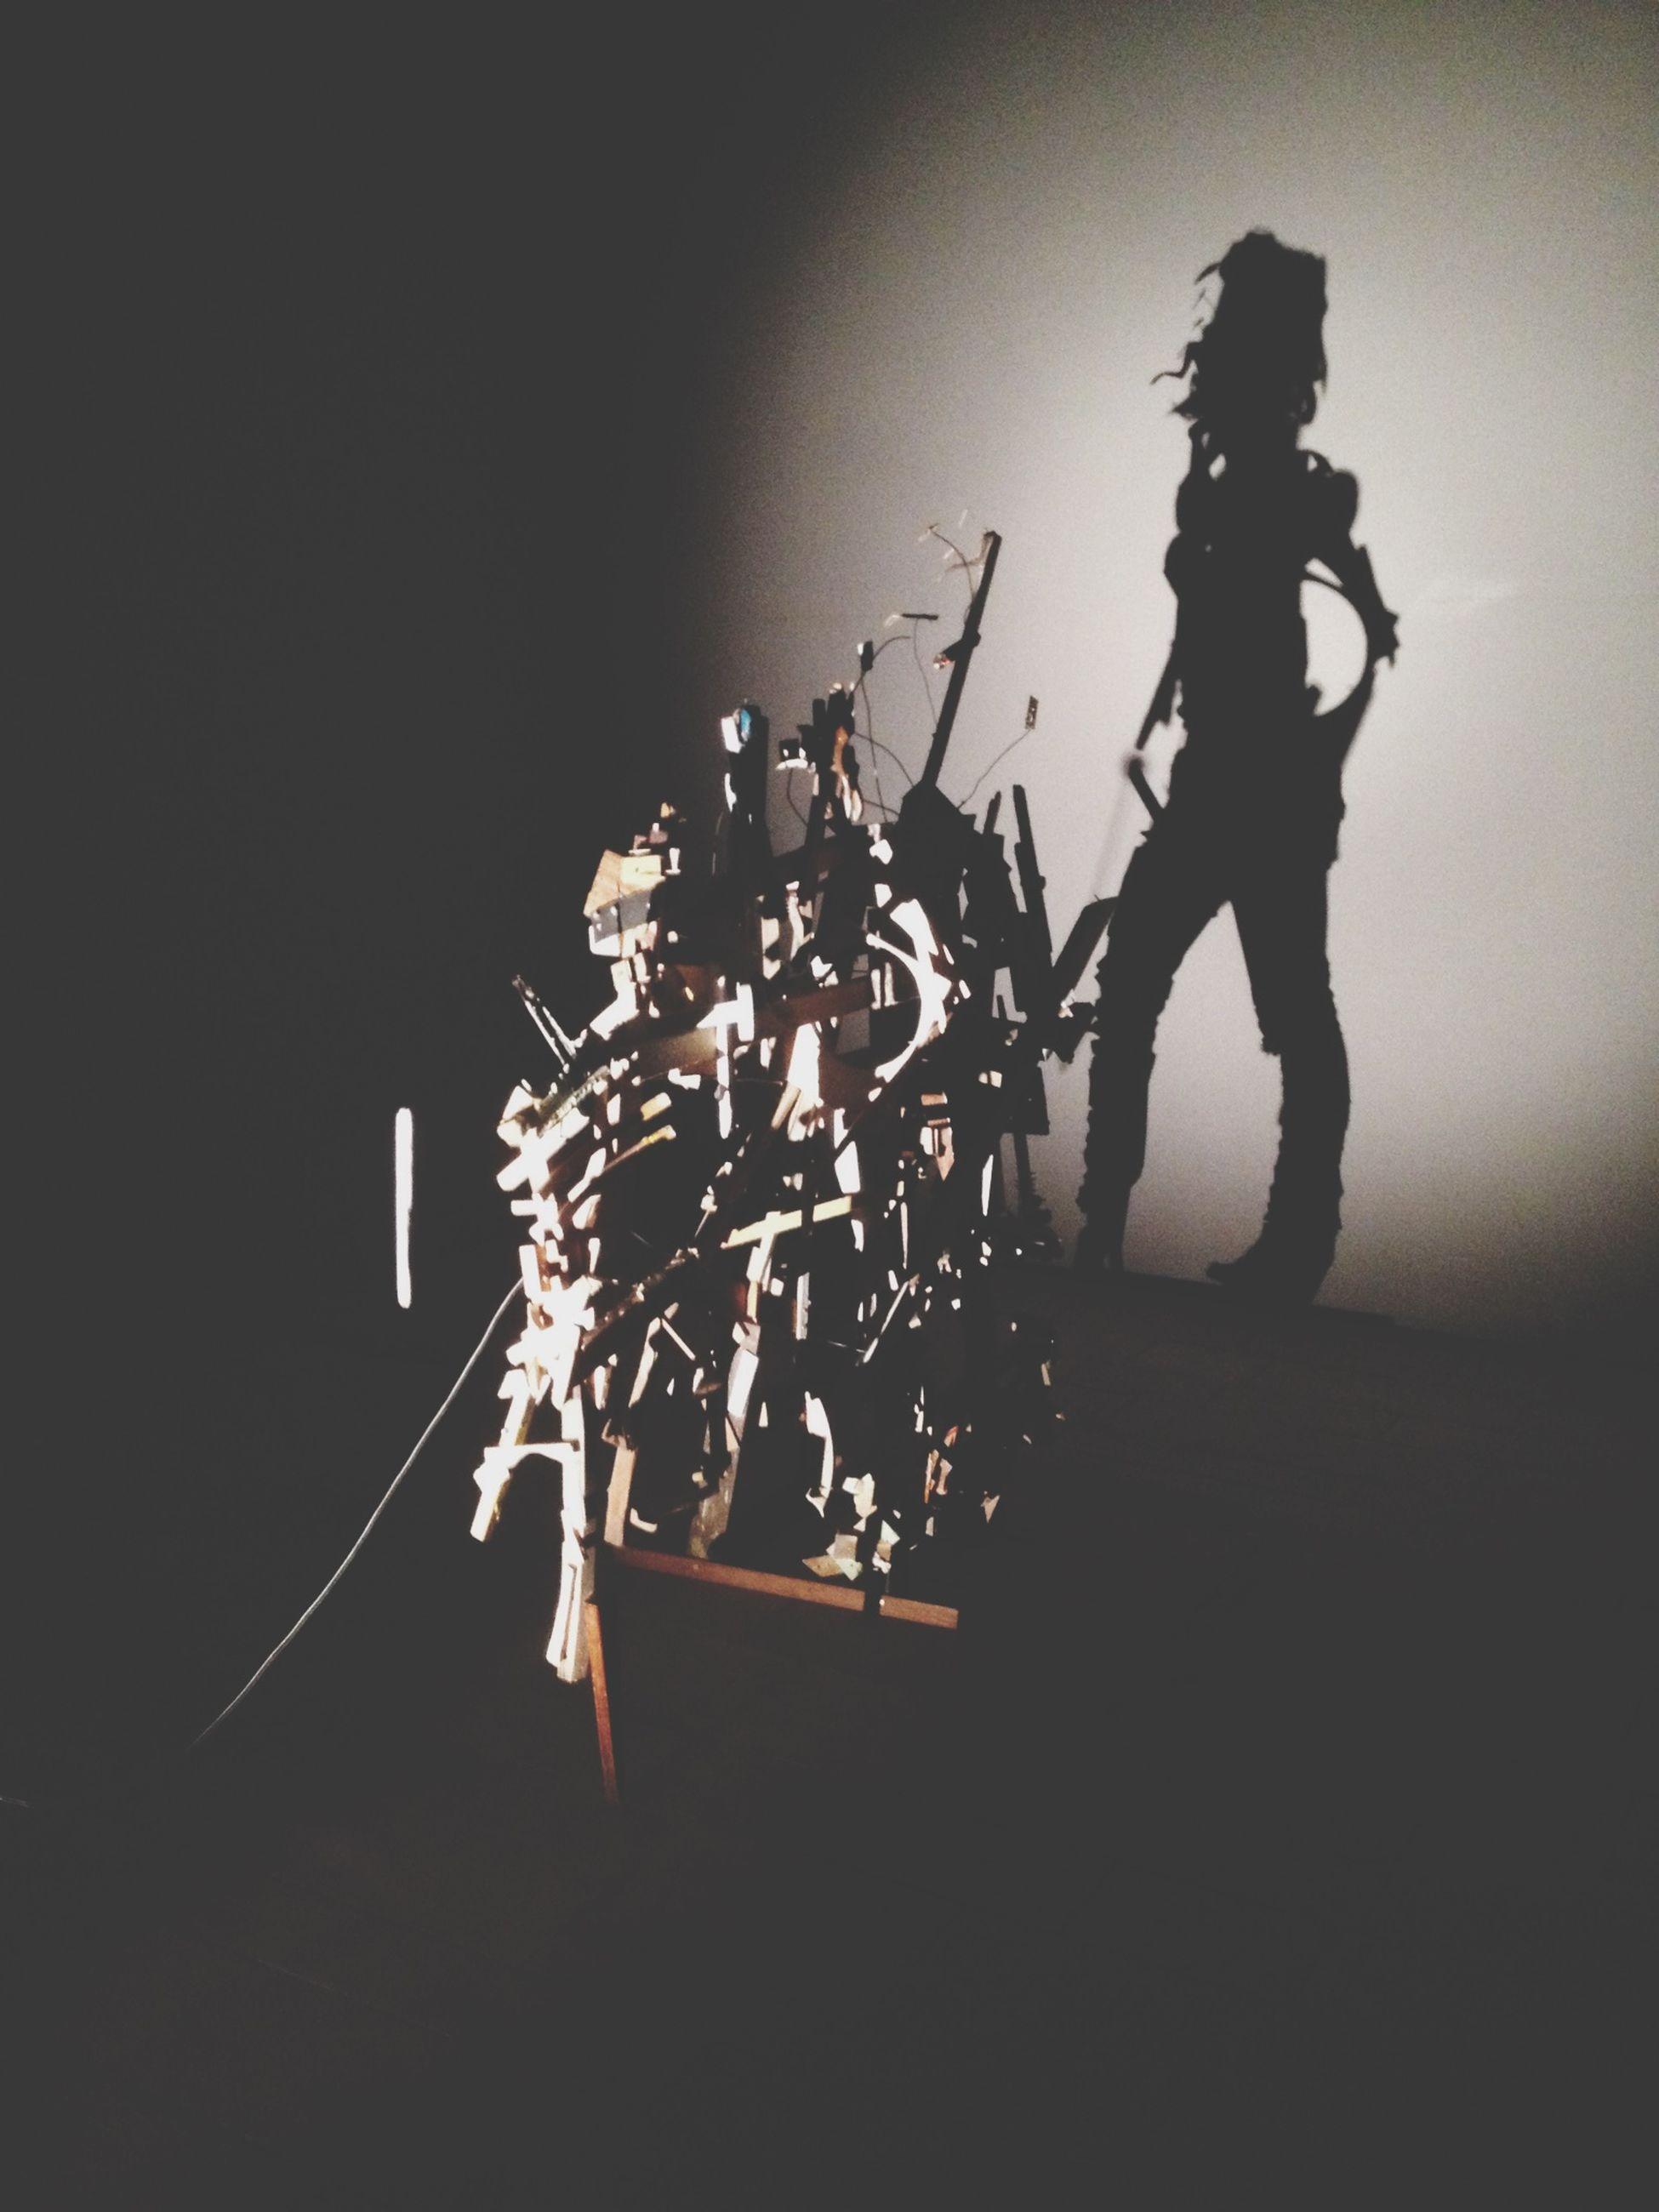 studio shot, night, low angle view, copy space, illuminated, decoration, lighting equipment, black background, no people, indoors, art and craft, hanging, close-up, decor, celebration, art, still life, electricity, creativity, dark